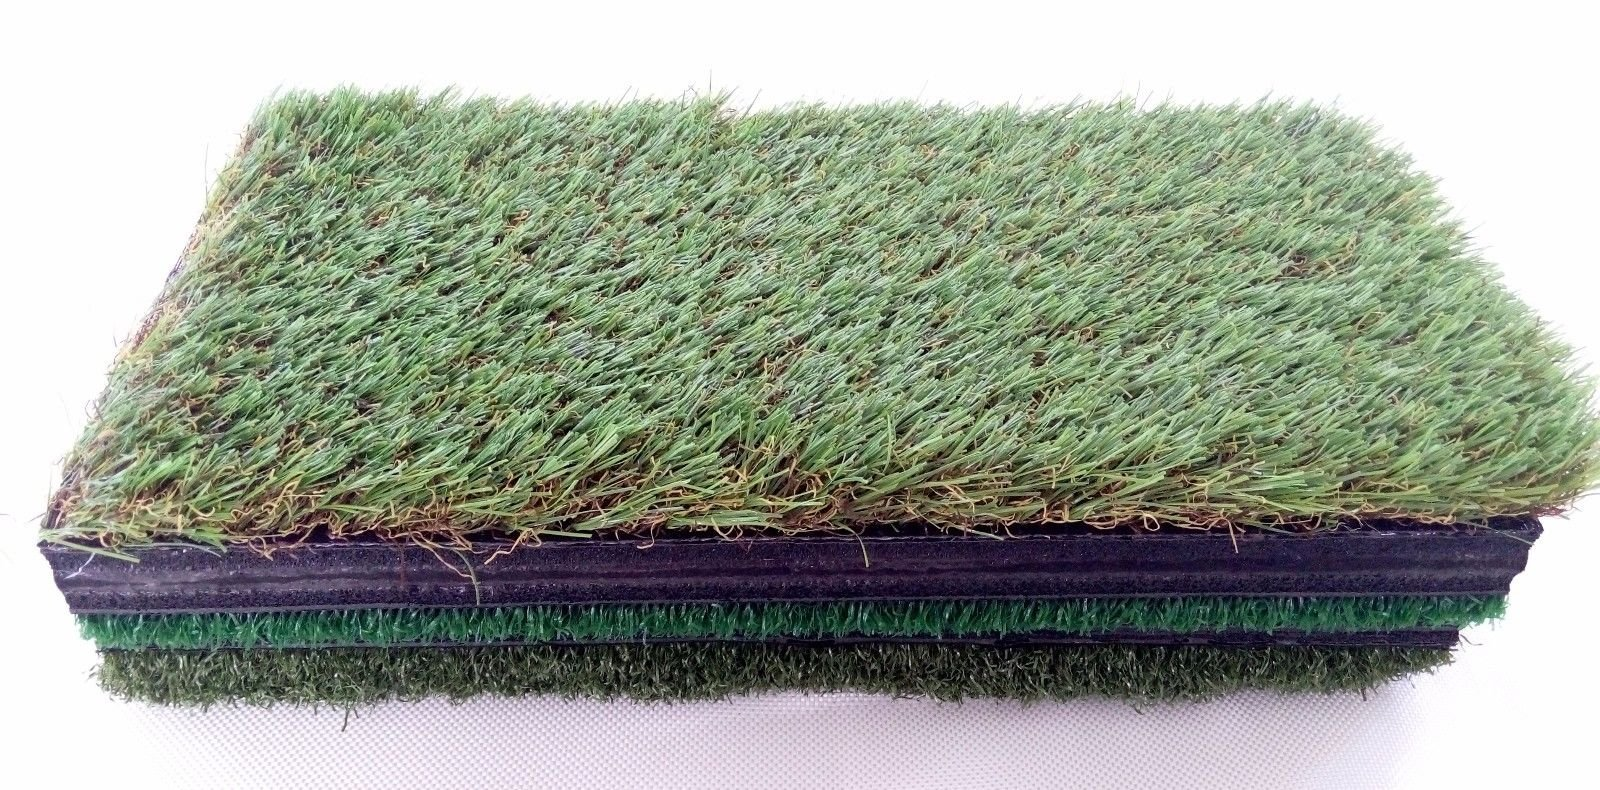 TrueBirdie Golf Mat for Indoor or Outdoor Practice - Multi Surface Golf Hitting Mat Perfect for Backyard Practice - 6 Foam Golf Balls Included by TrueBirdie